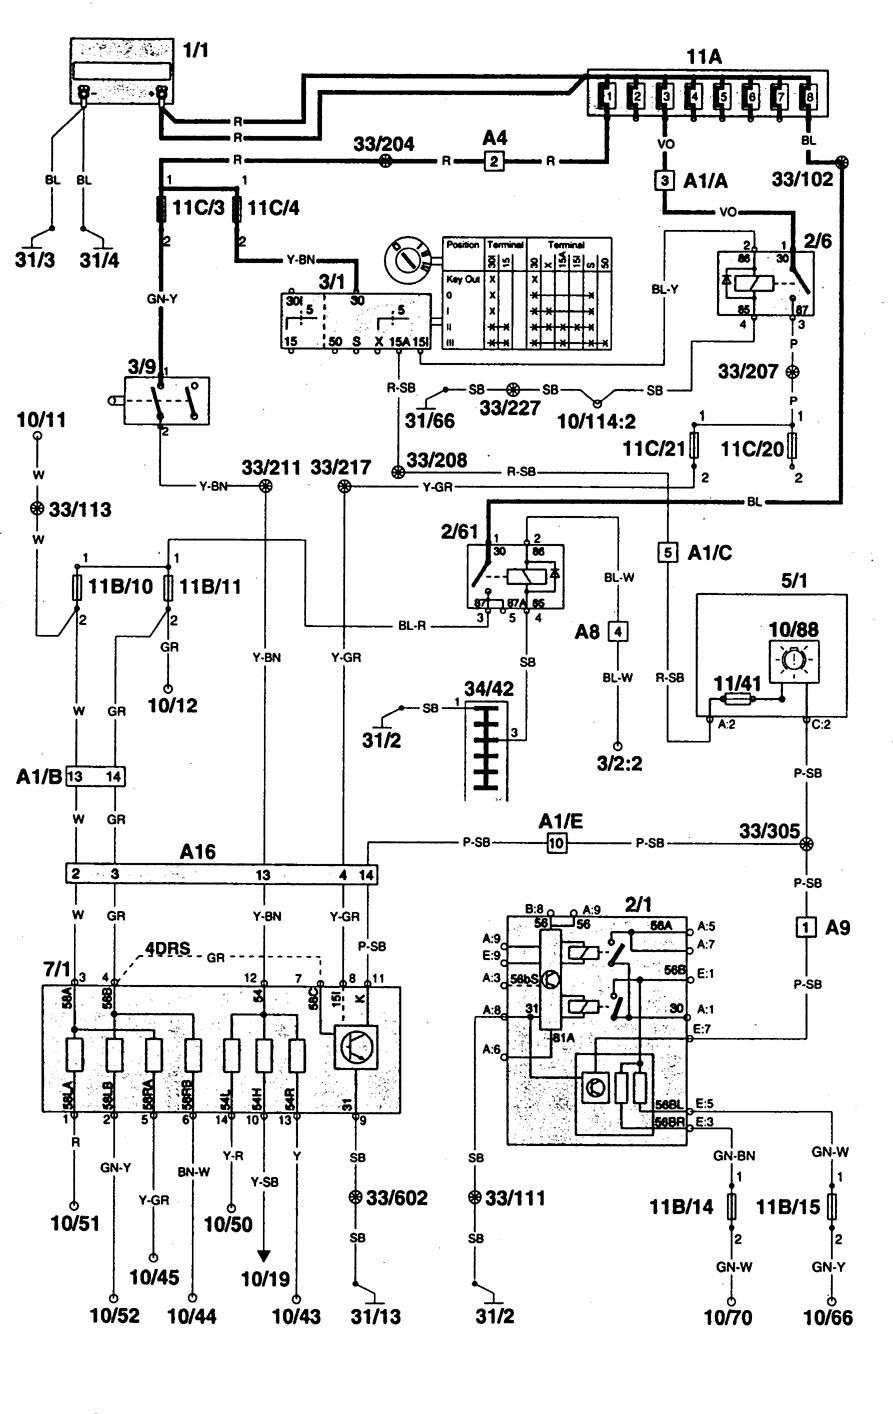 2013 Chevy Malibu Fuse Box Diagram Besides Kawasaki Mule 610 Fuse Box